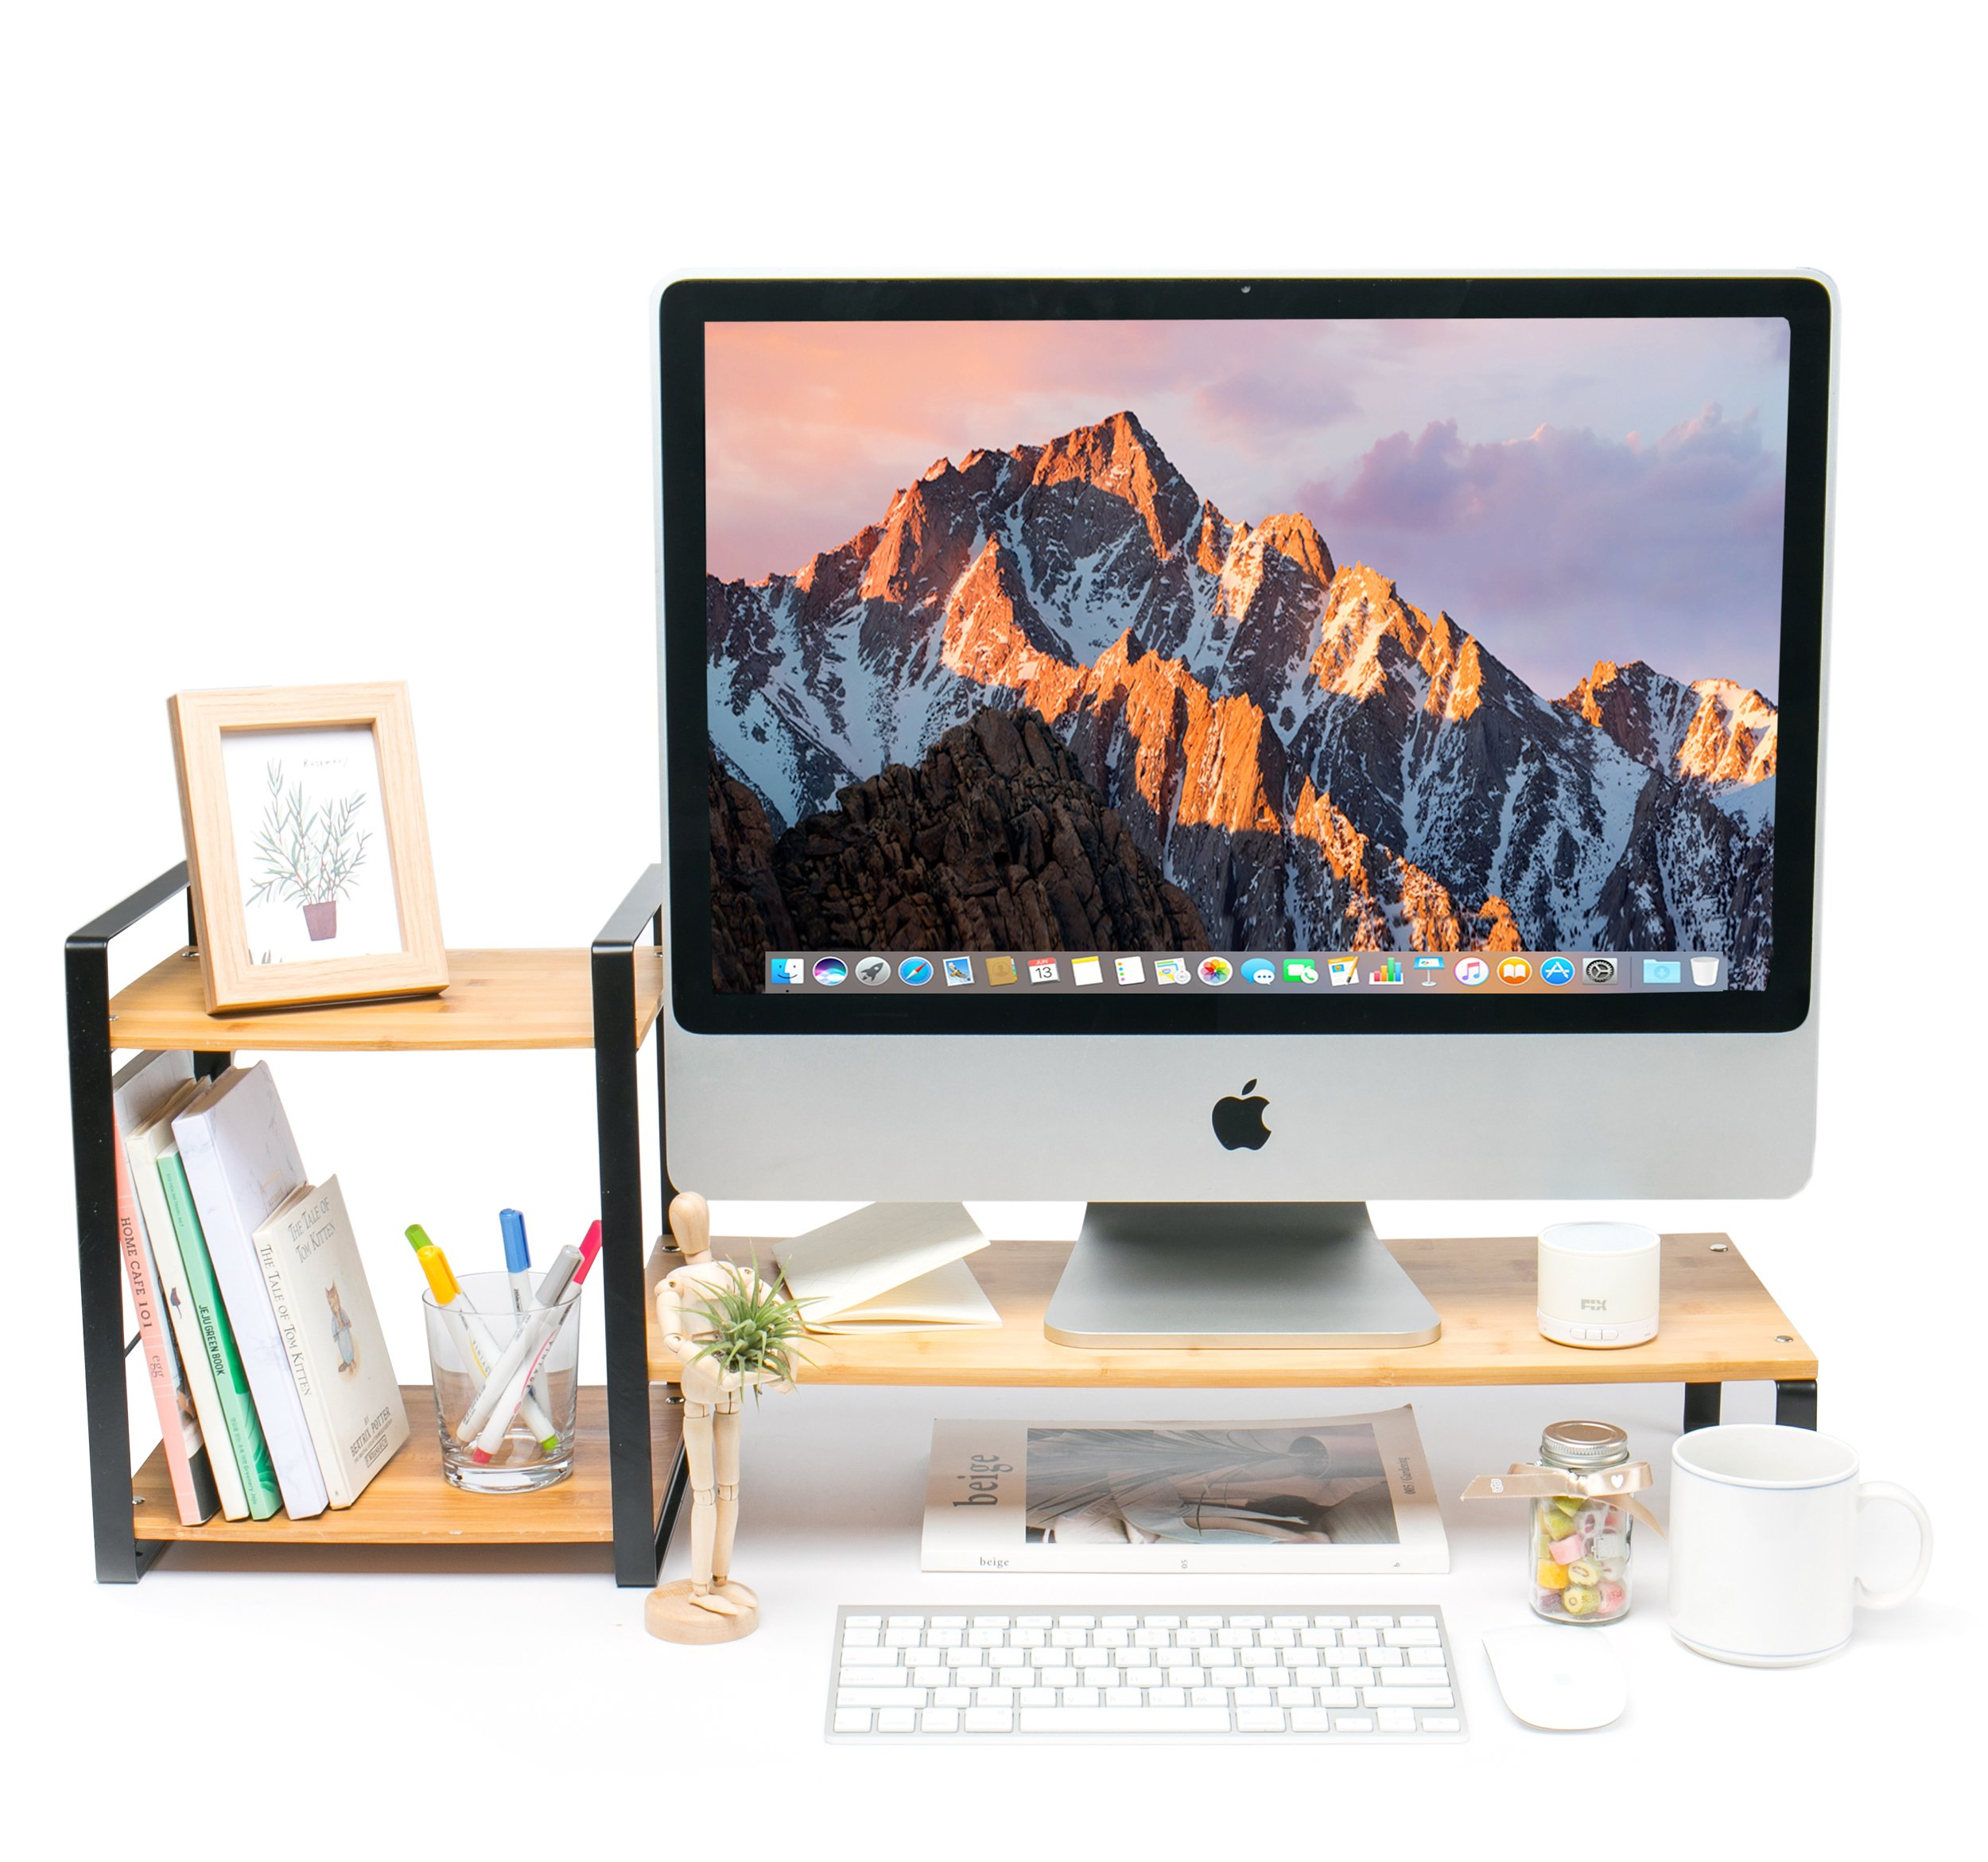 JackCubeDesign Bamboo Monitor Stand Computer Riser with 2-Tier Desktop Bookshelf Countertop Bookcase,Book Storage Organizer Display Shelf Rack for Home Office– :MK363A